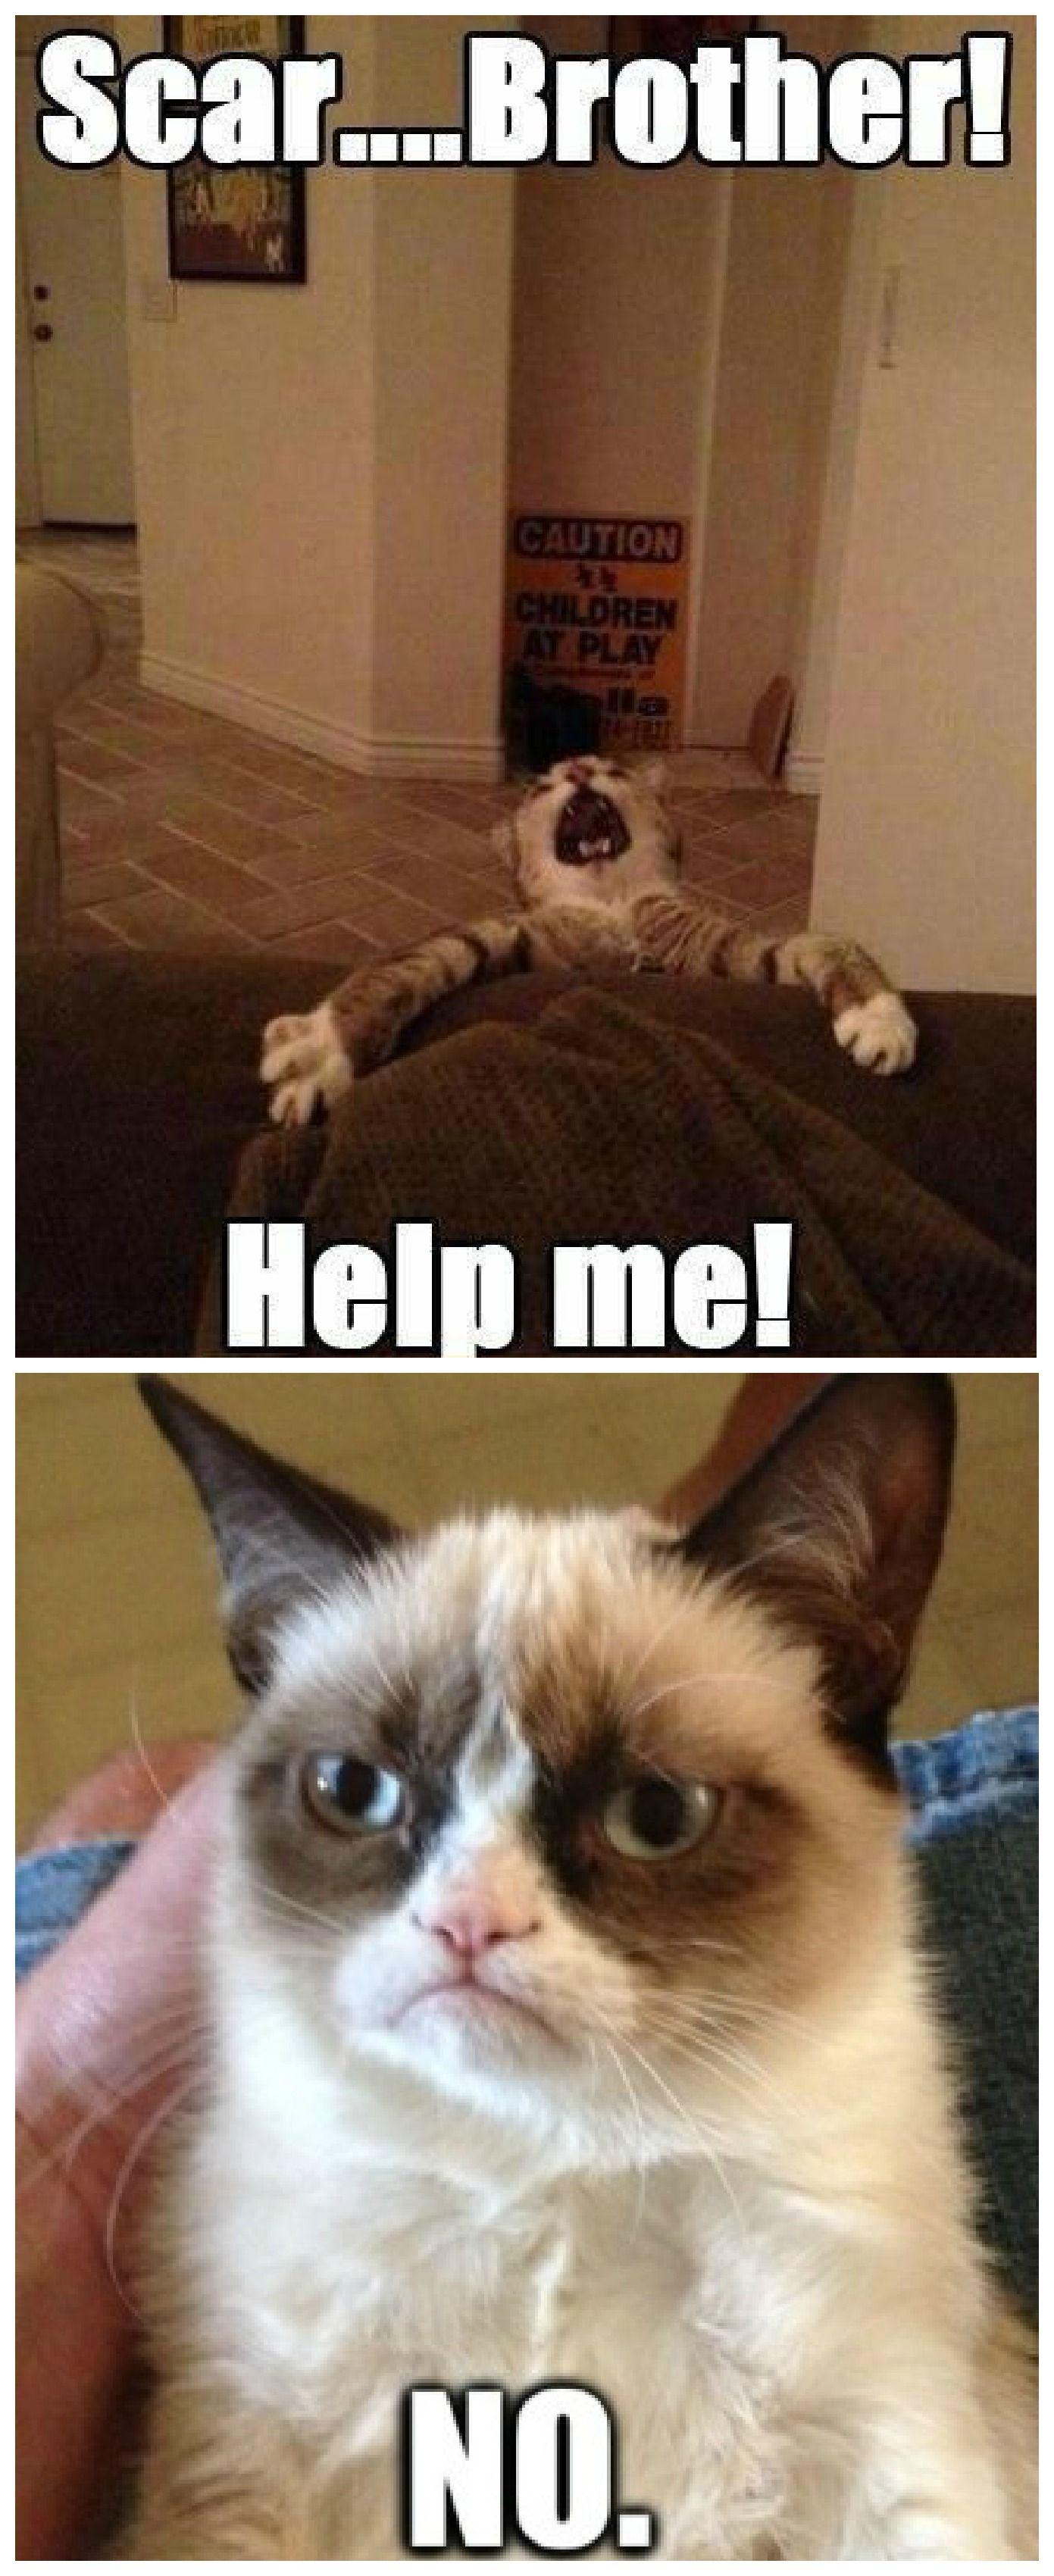 Funny Grumpy Cat Christmas Memes.Lion King Vs Grumpy Cat Giggles Funny Grumpy Cat Memes